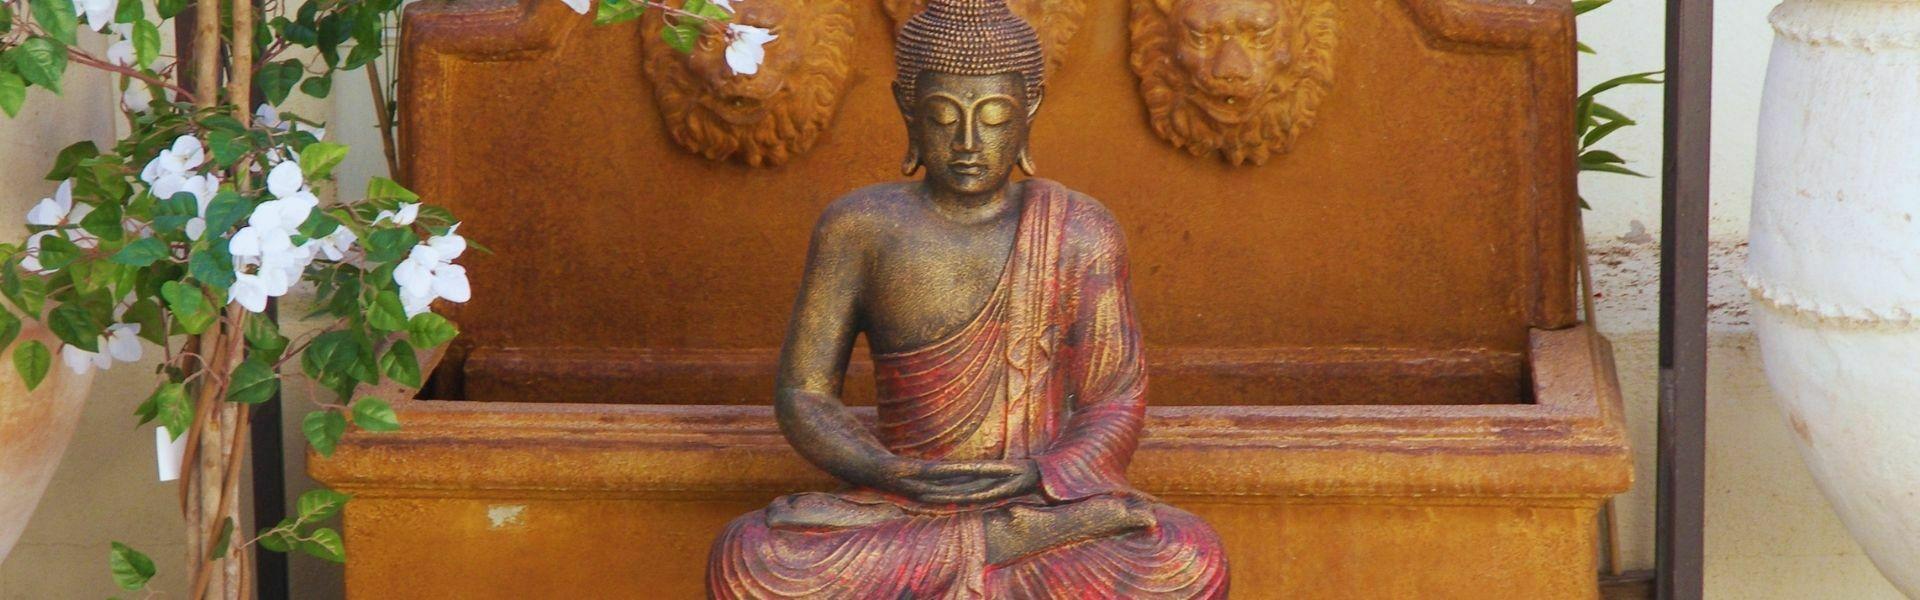 decoracion budista